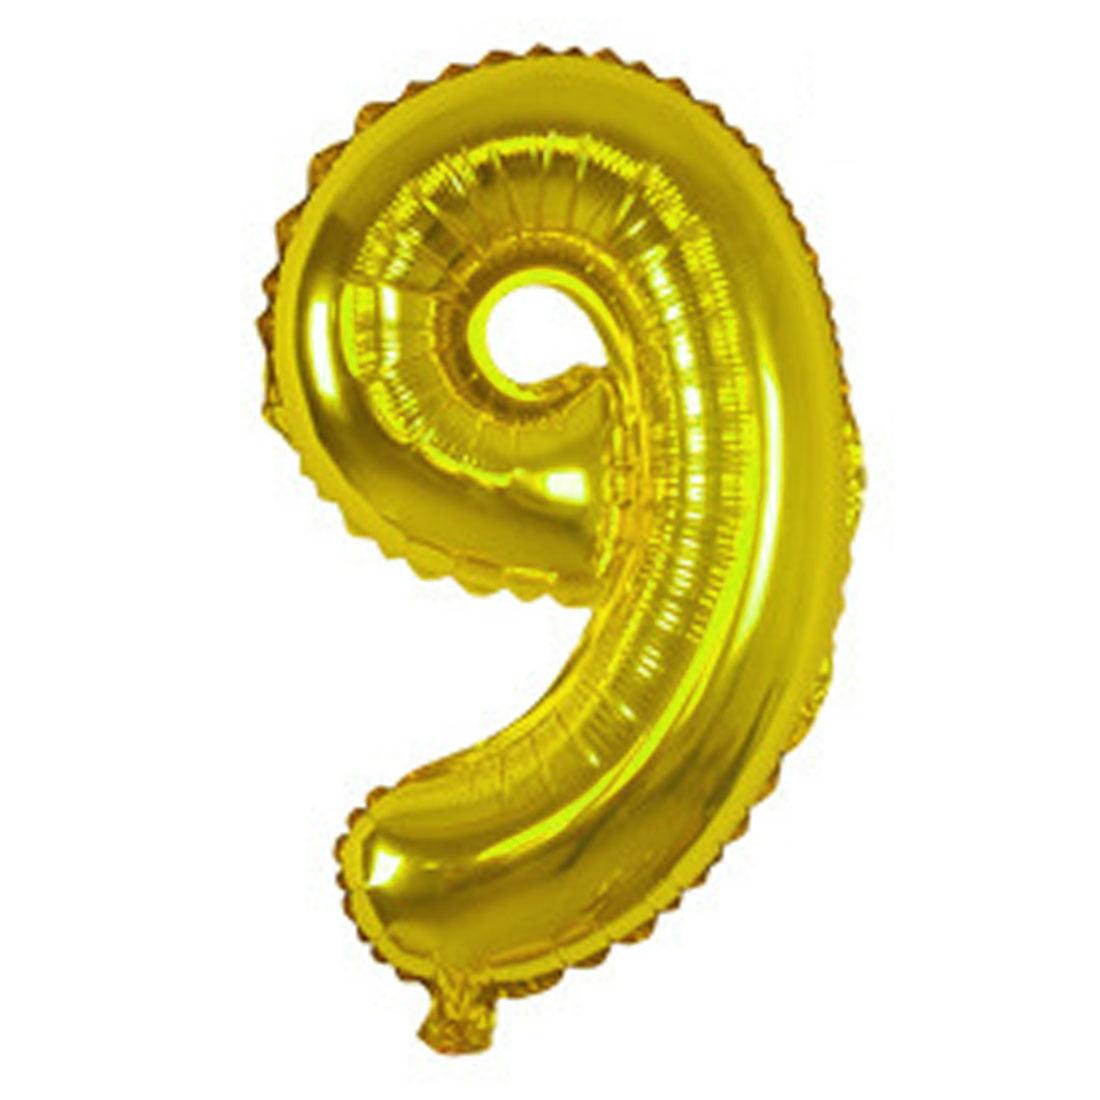 "Unique Bargains Foil Number 9 Shape Helium Balloon Birthday Wedding Decor Gold Tone 16"""